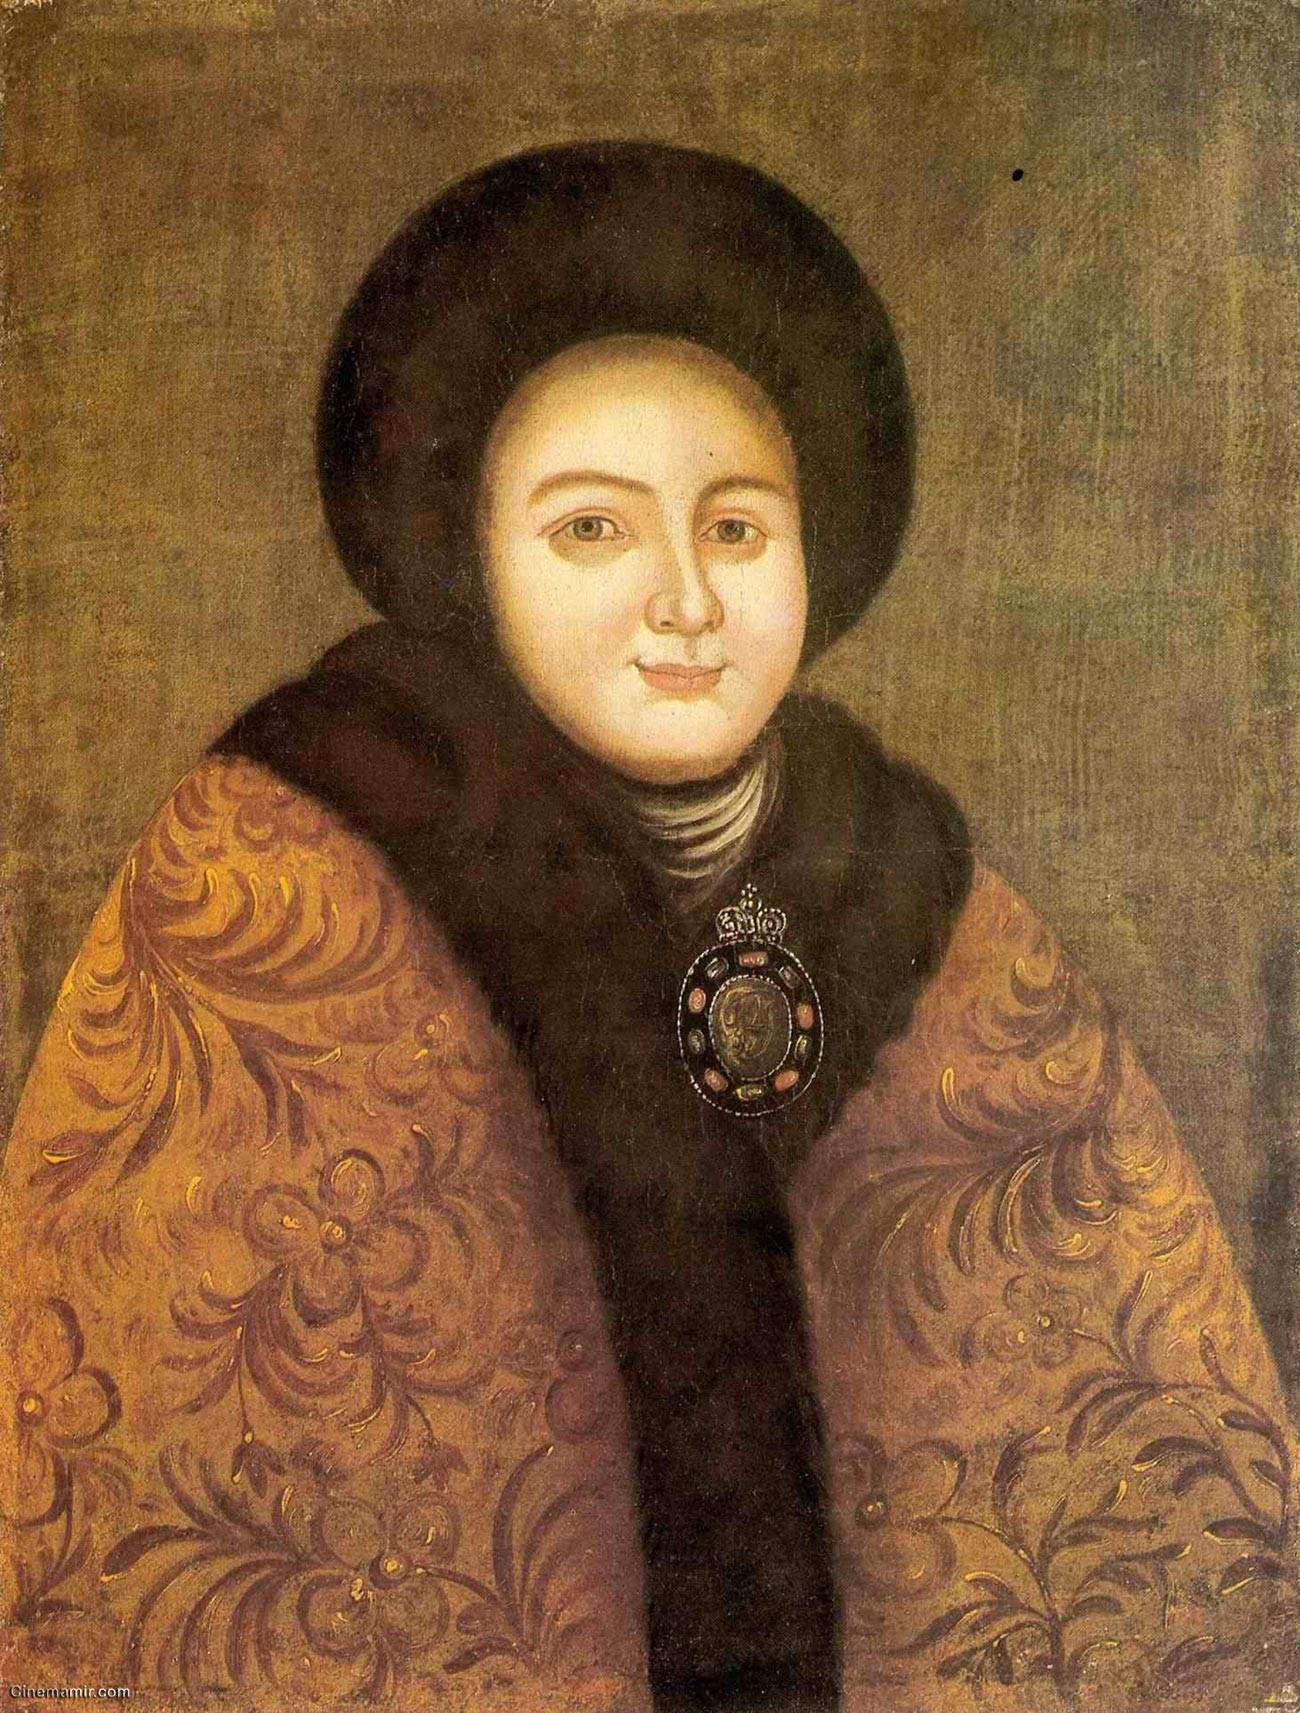 Јевдокија Лопухина